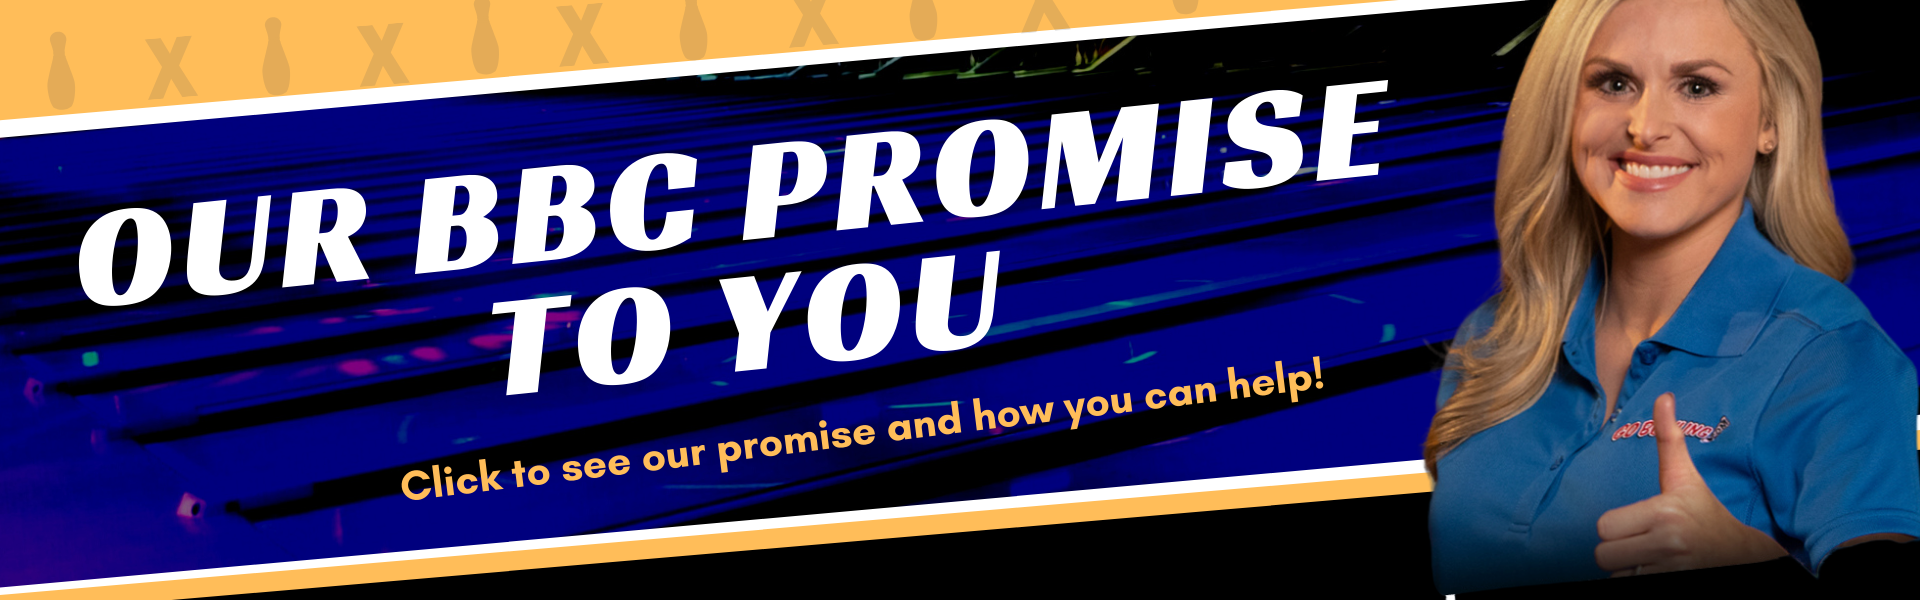 Bardon Bowling Centers Promise | COVID procedures | Odyssey Fun Center | Sheboygan WI